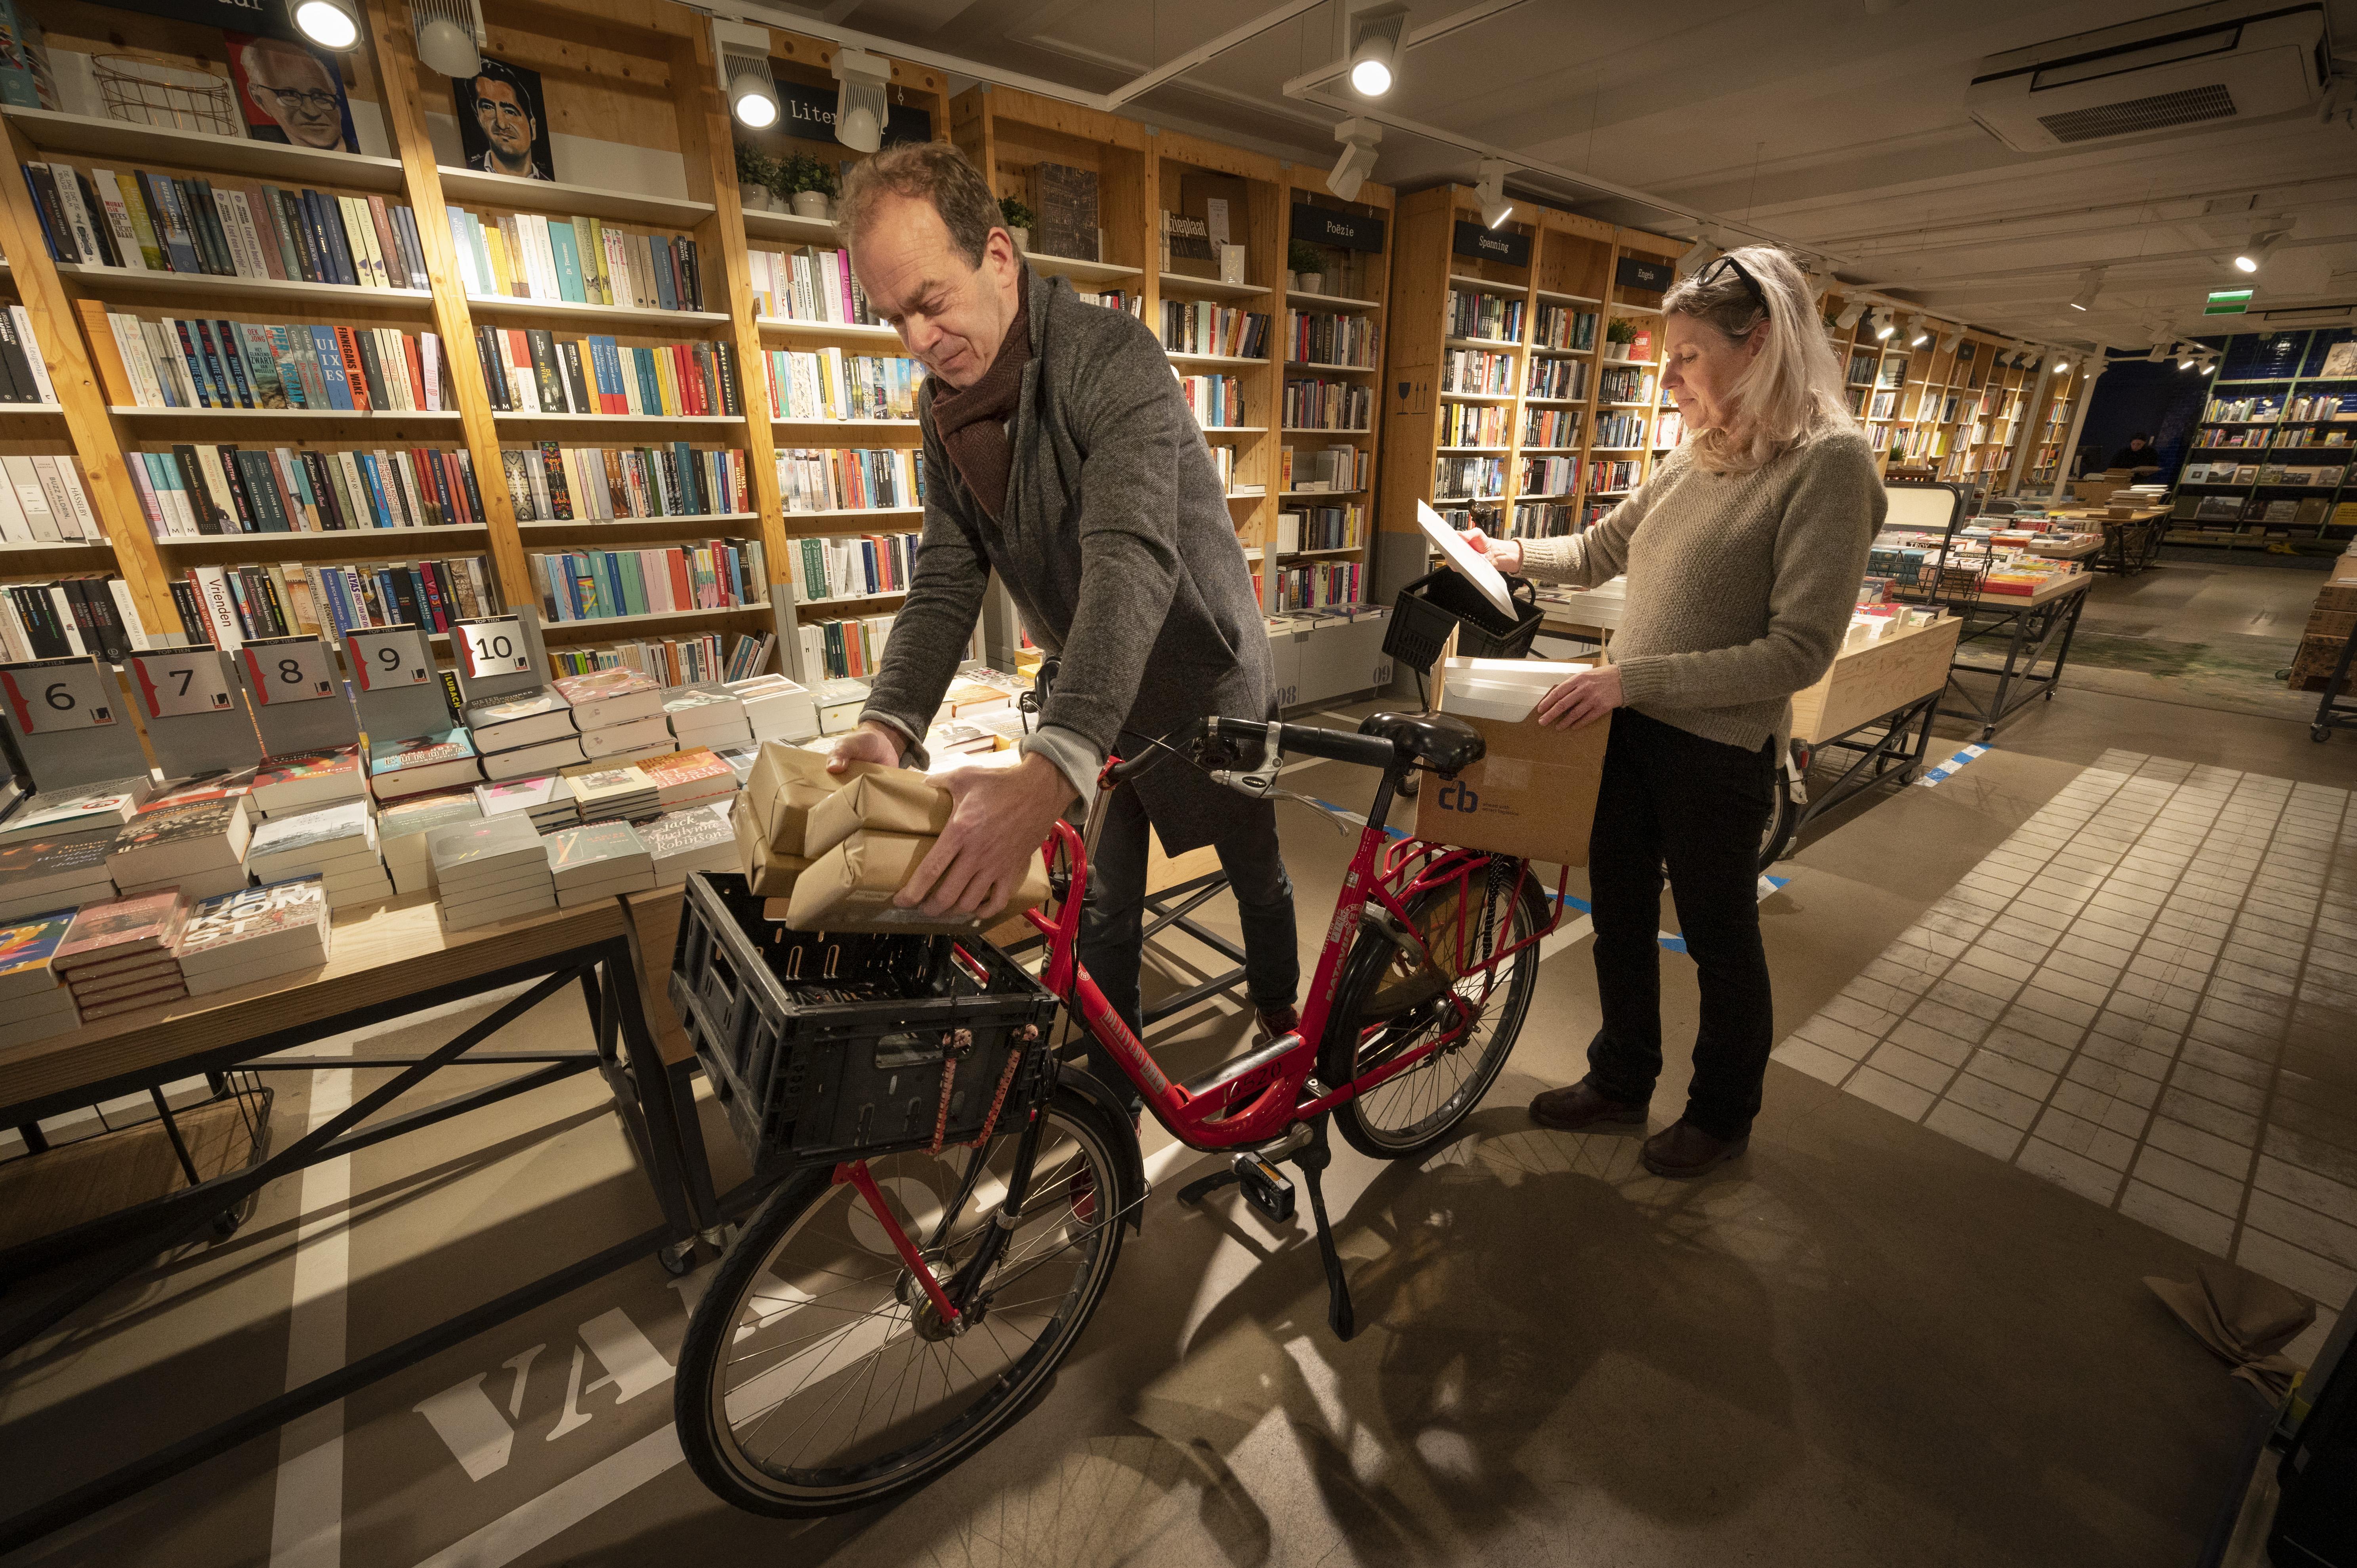 Grote groep vrijwilligers helpt Leidse boekhandel Kooyker : 'Oh, wat fijn dat jullie dit doen'